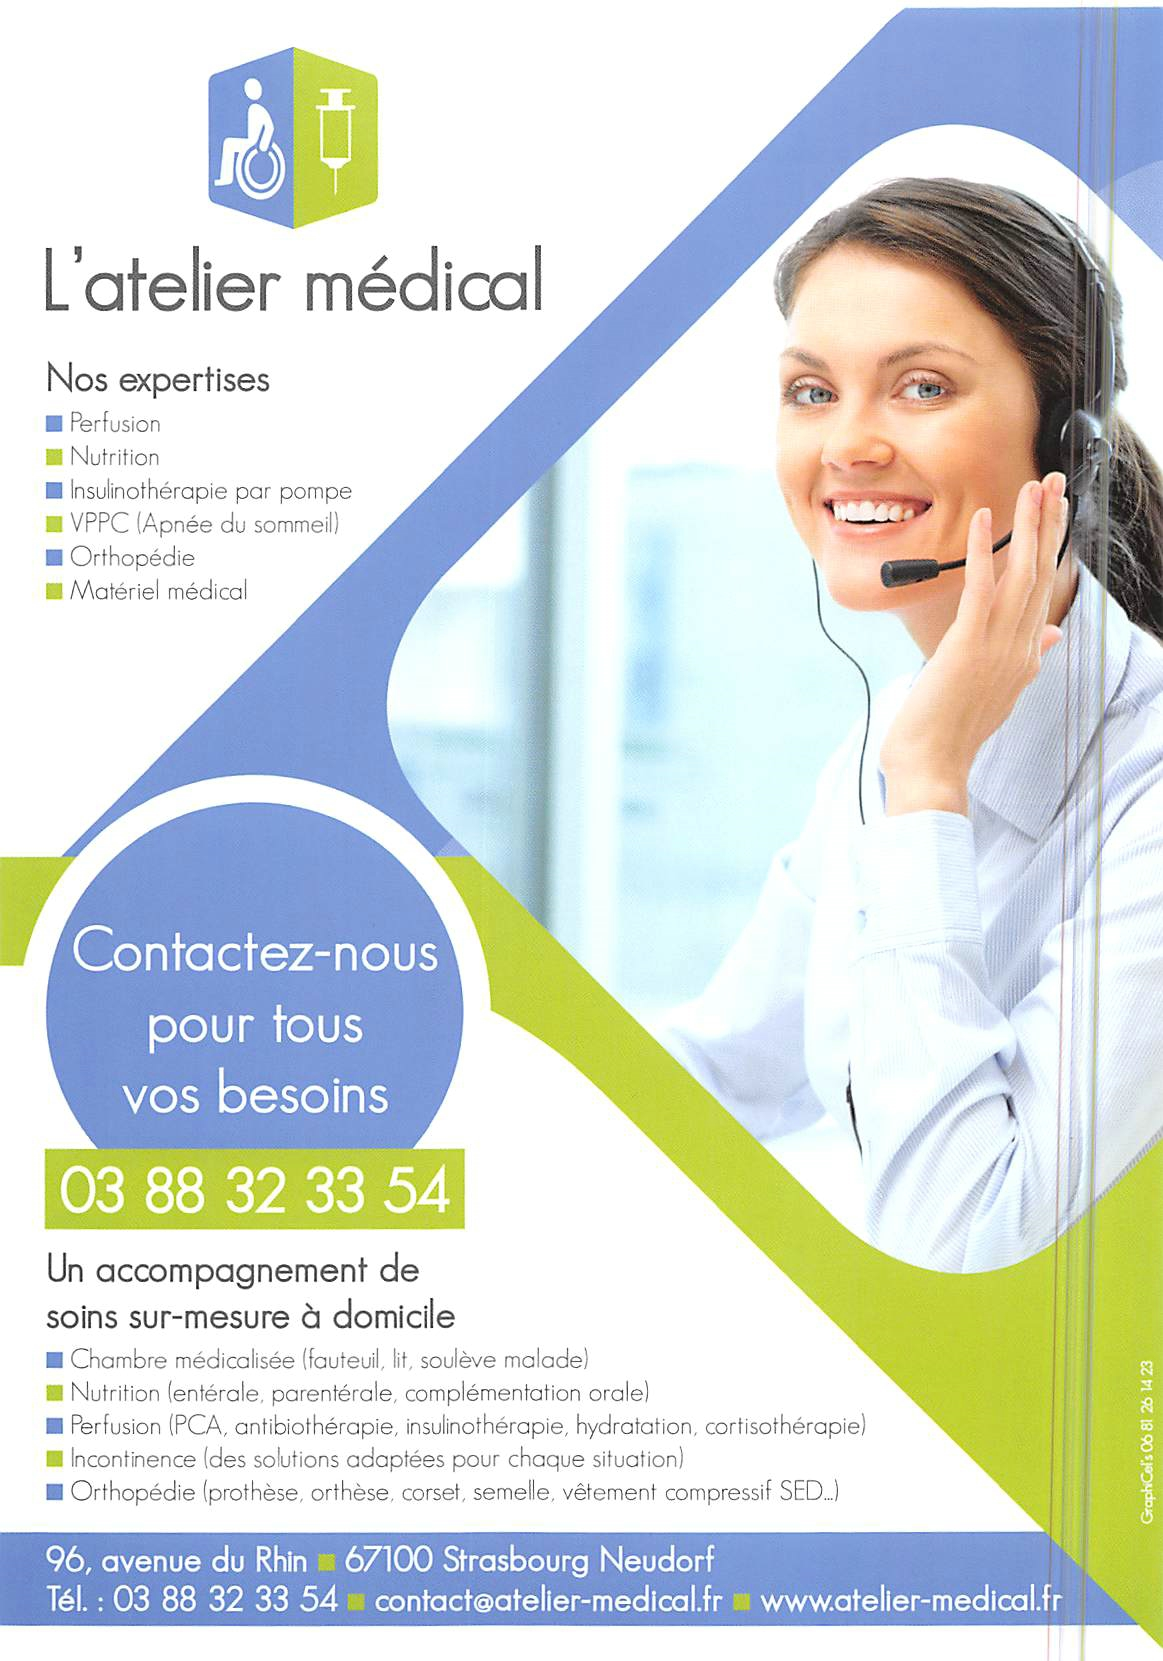 http://atelier-medical.fr/wp-content/uploads/2018/10/flyer-oct-18.jpg